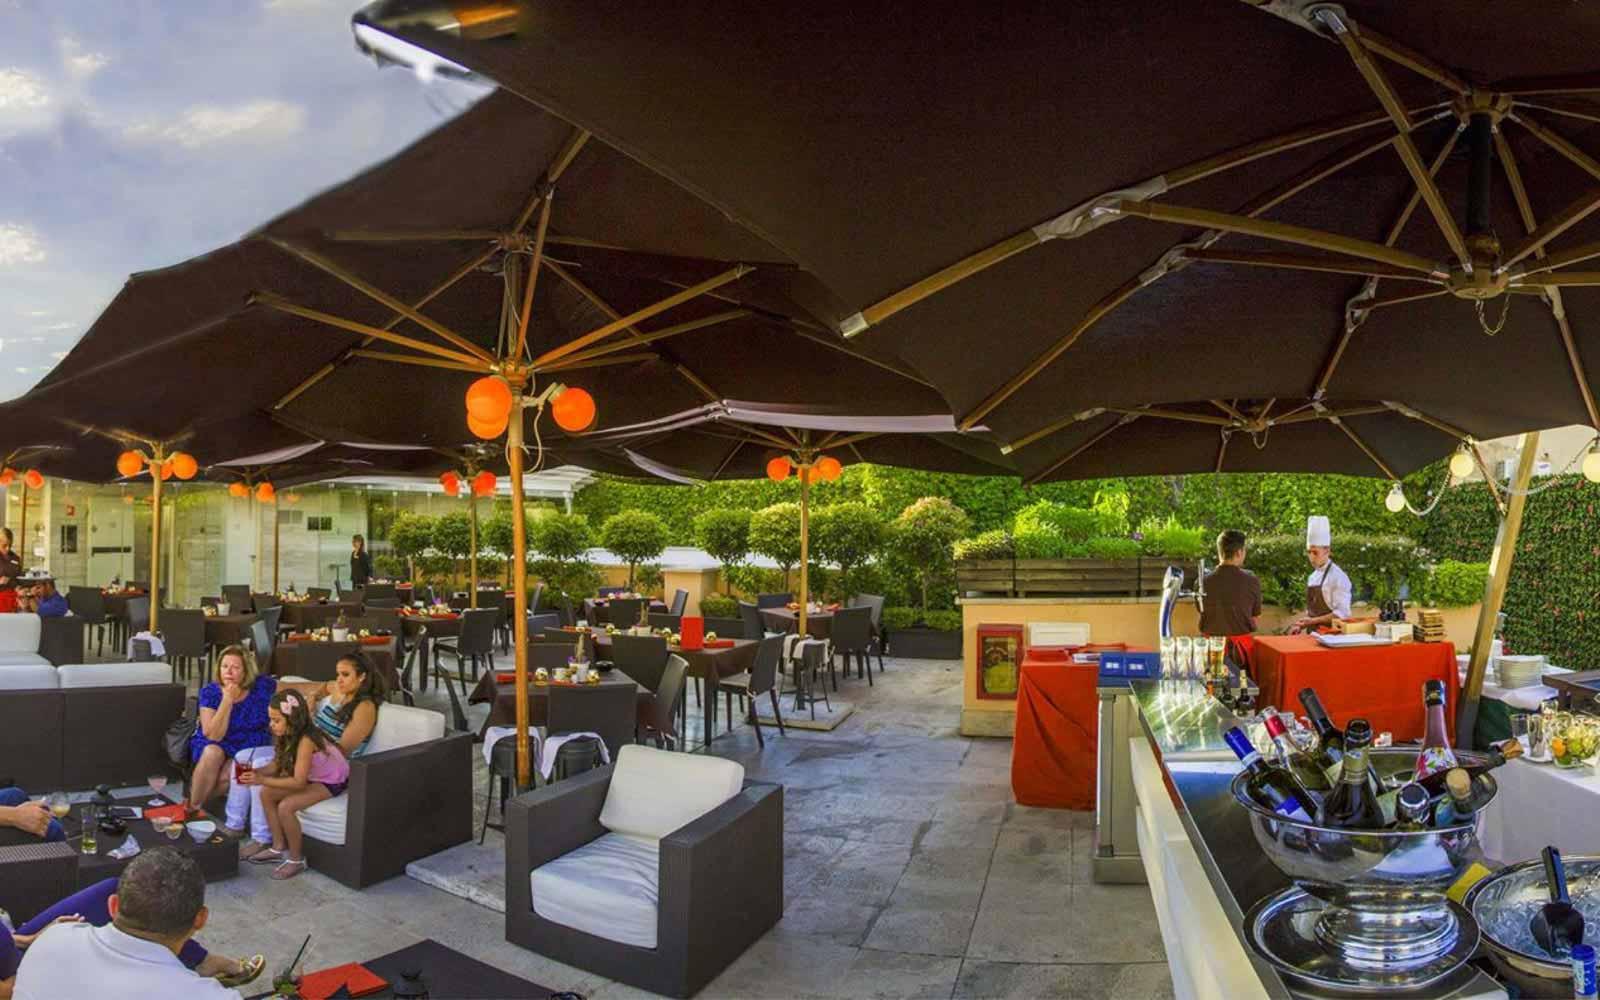 Sky Bar and grill at the Grand Hotel Via Veneto